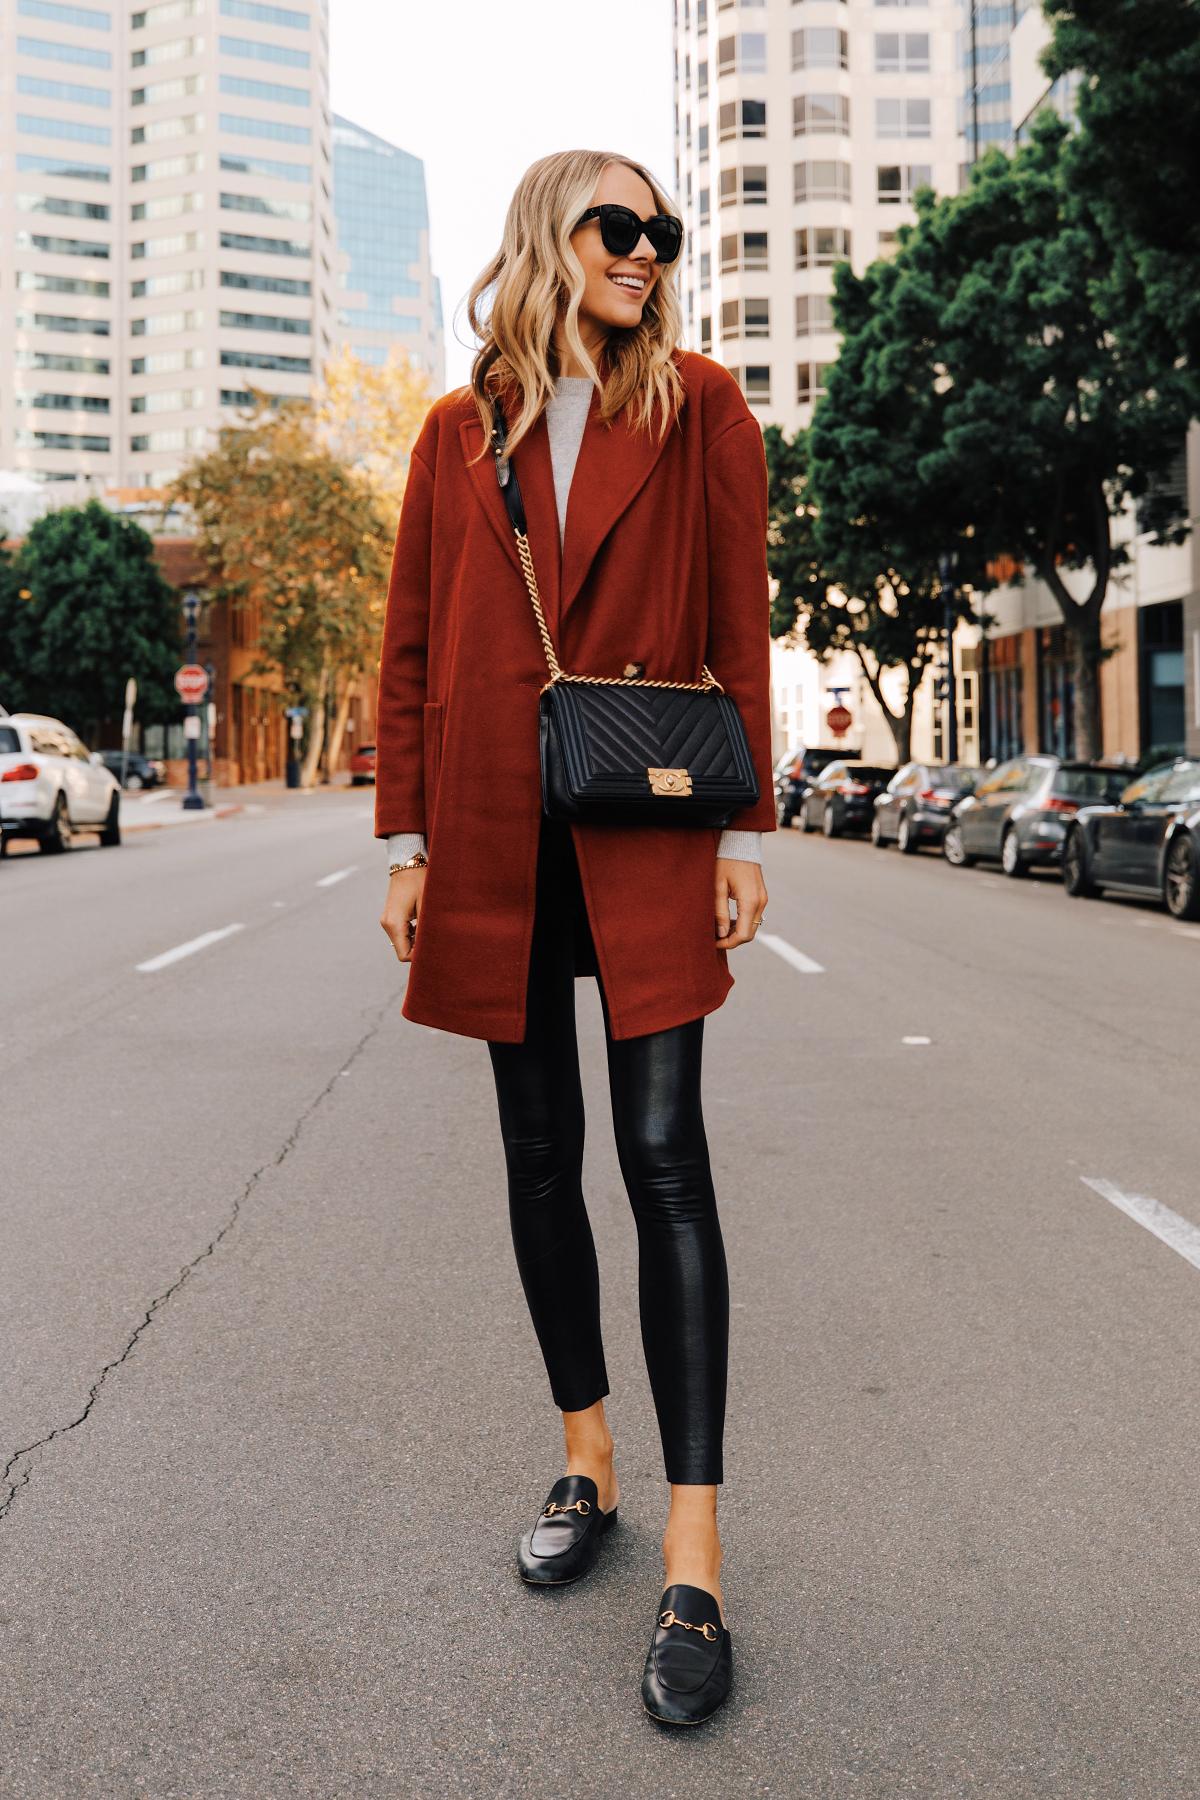 Fashion Jackson Wearing Topshop Red Wool Coat Grey Sweater Commando Faux Leather Leggings Gucci Mules Chanel Black Boy Bag